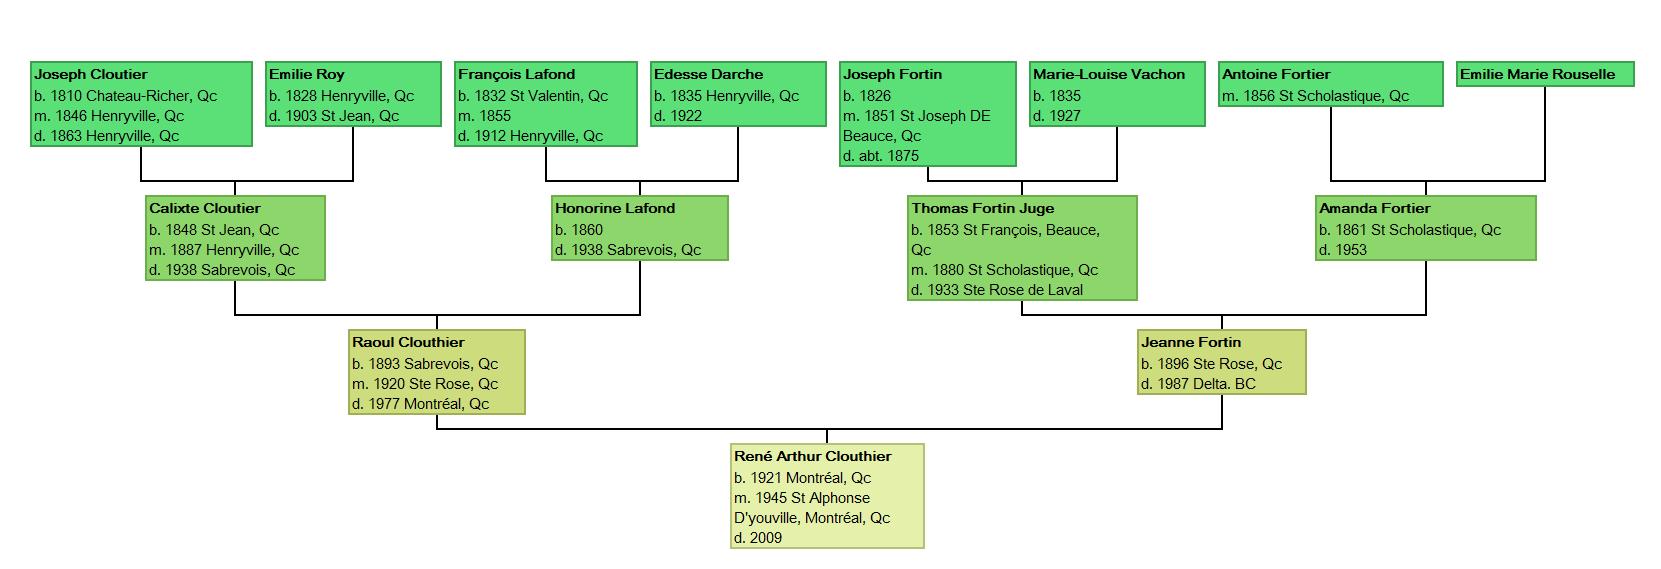 Ancestor Bottom-up